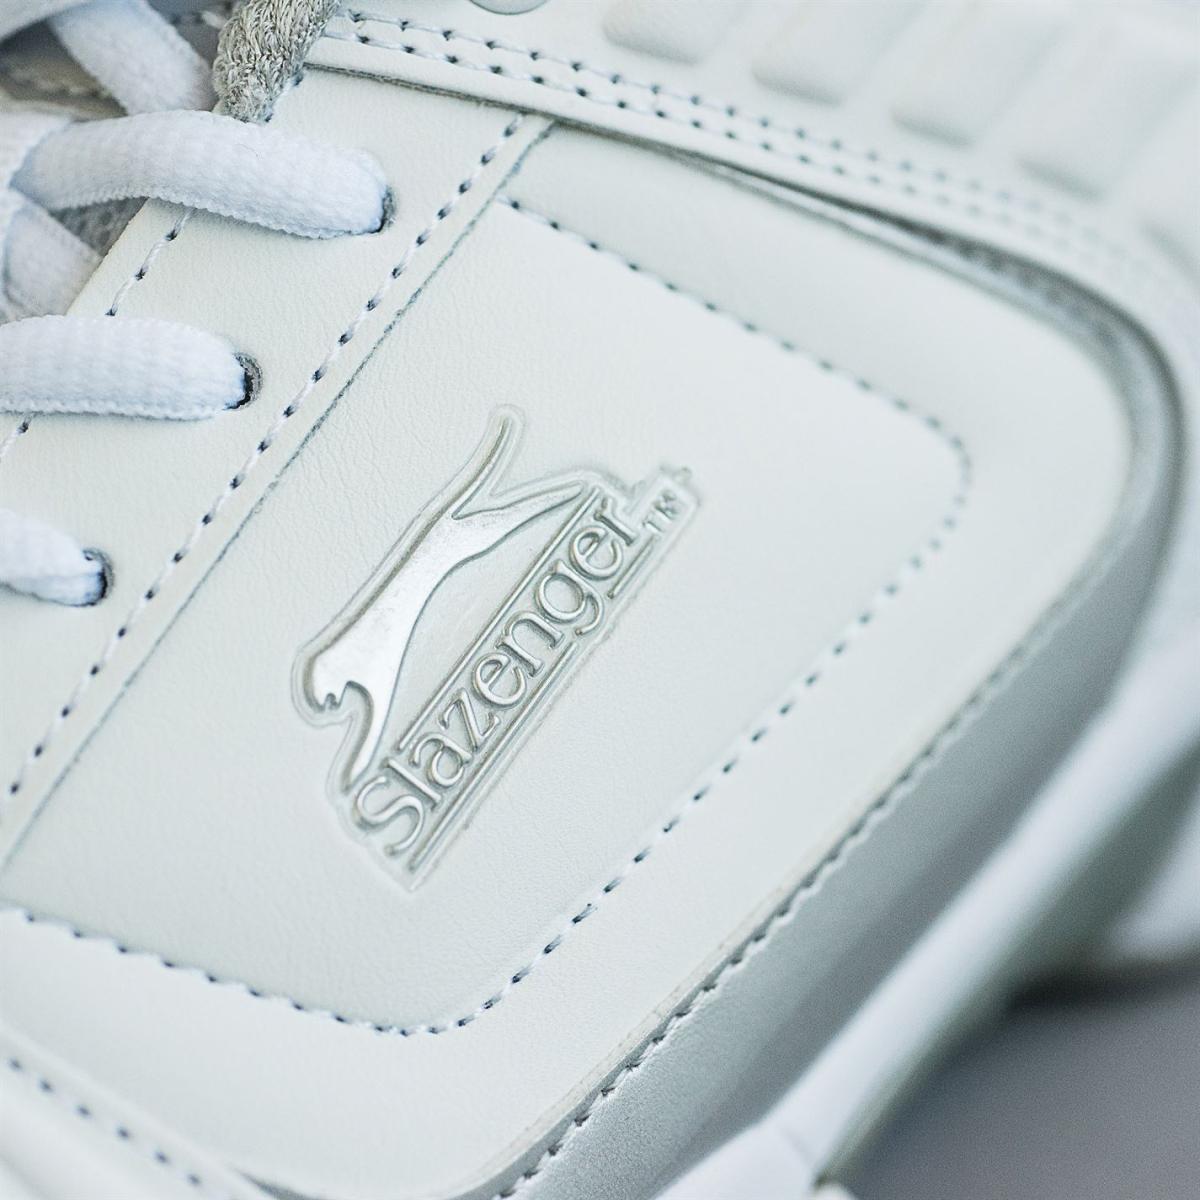 Slazenger-Turnschuhe-Laufschuhe-Damen-Sportschuhe-Sneakers-Lifestyle-6118 Indexbild 8